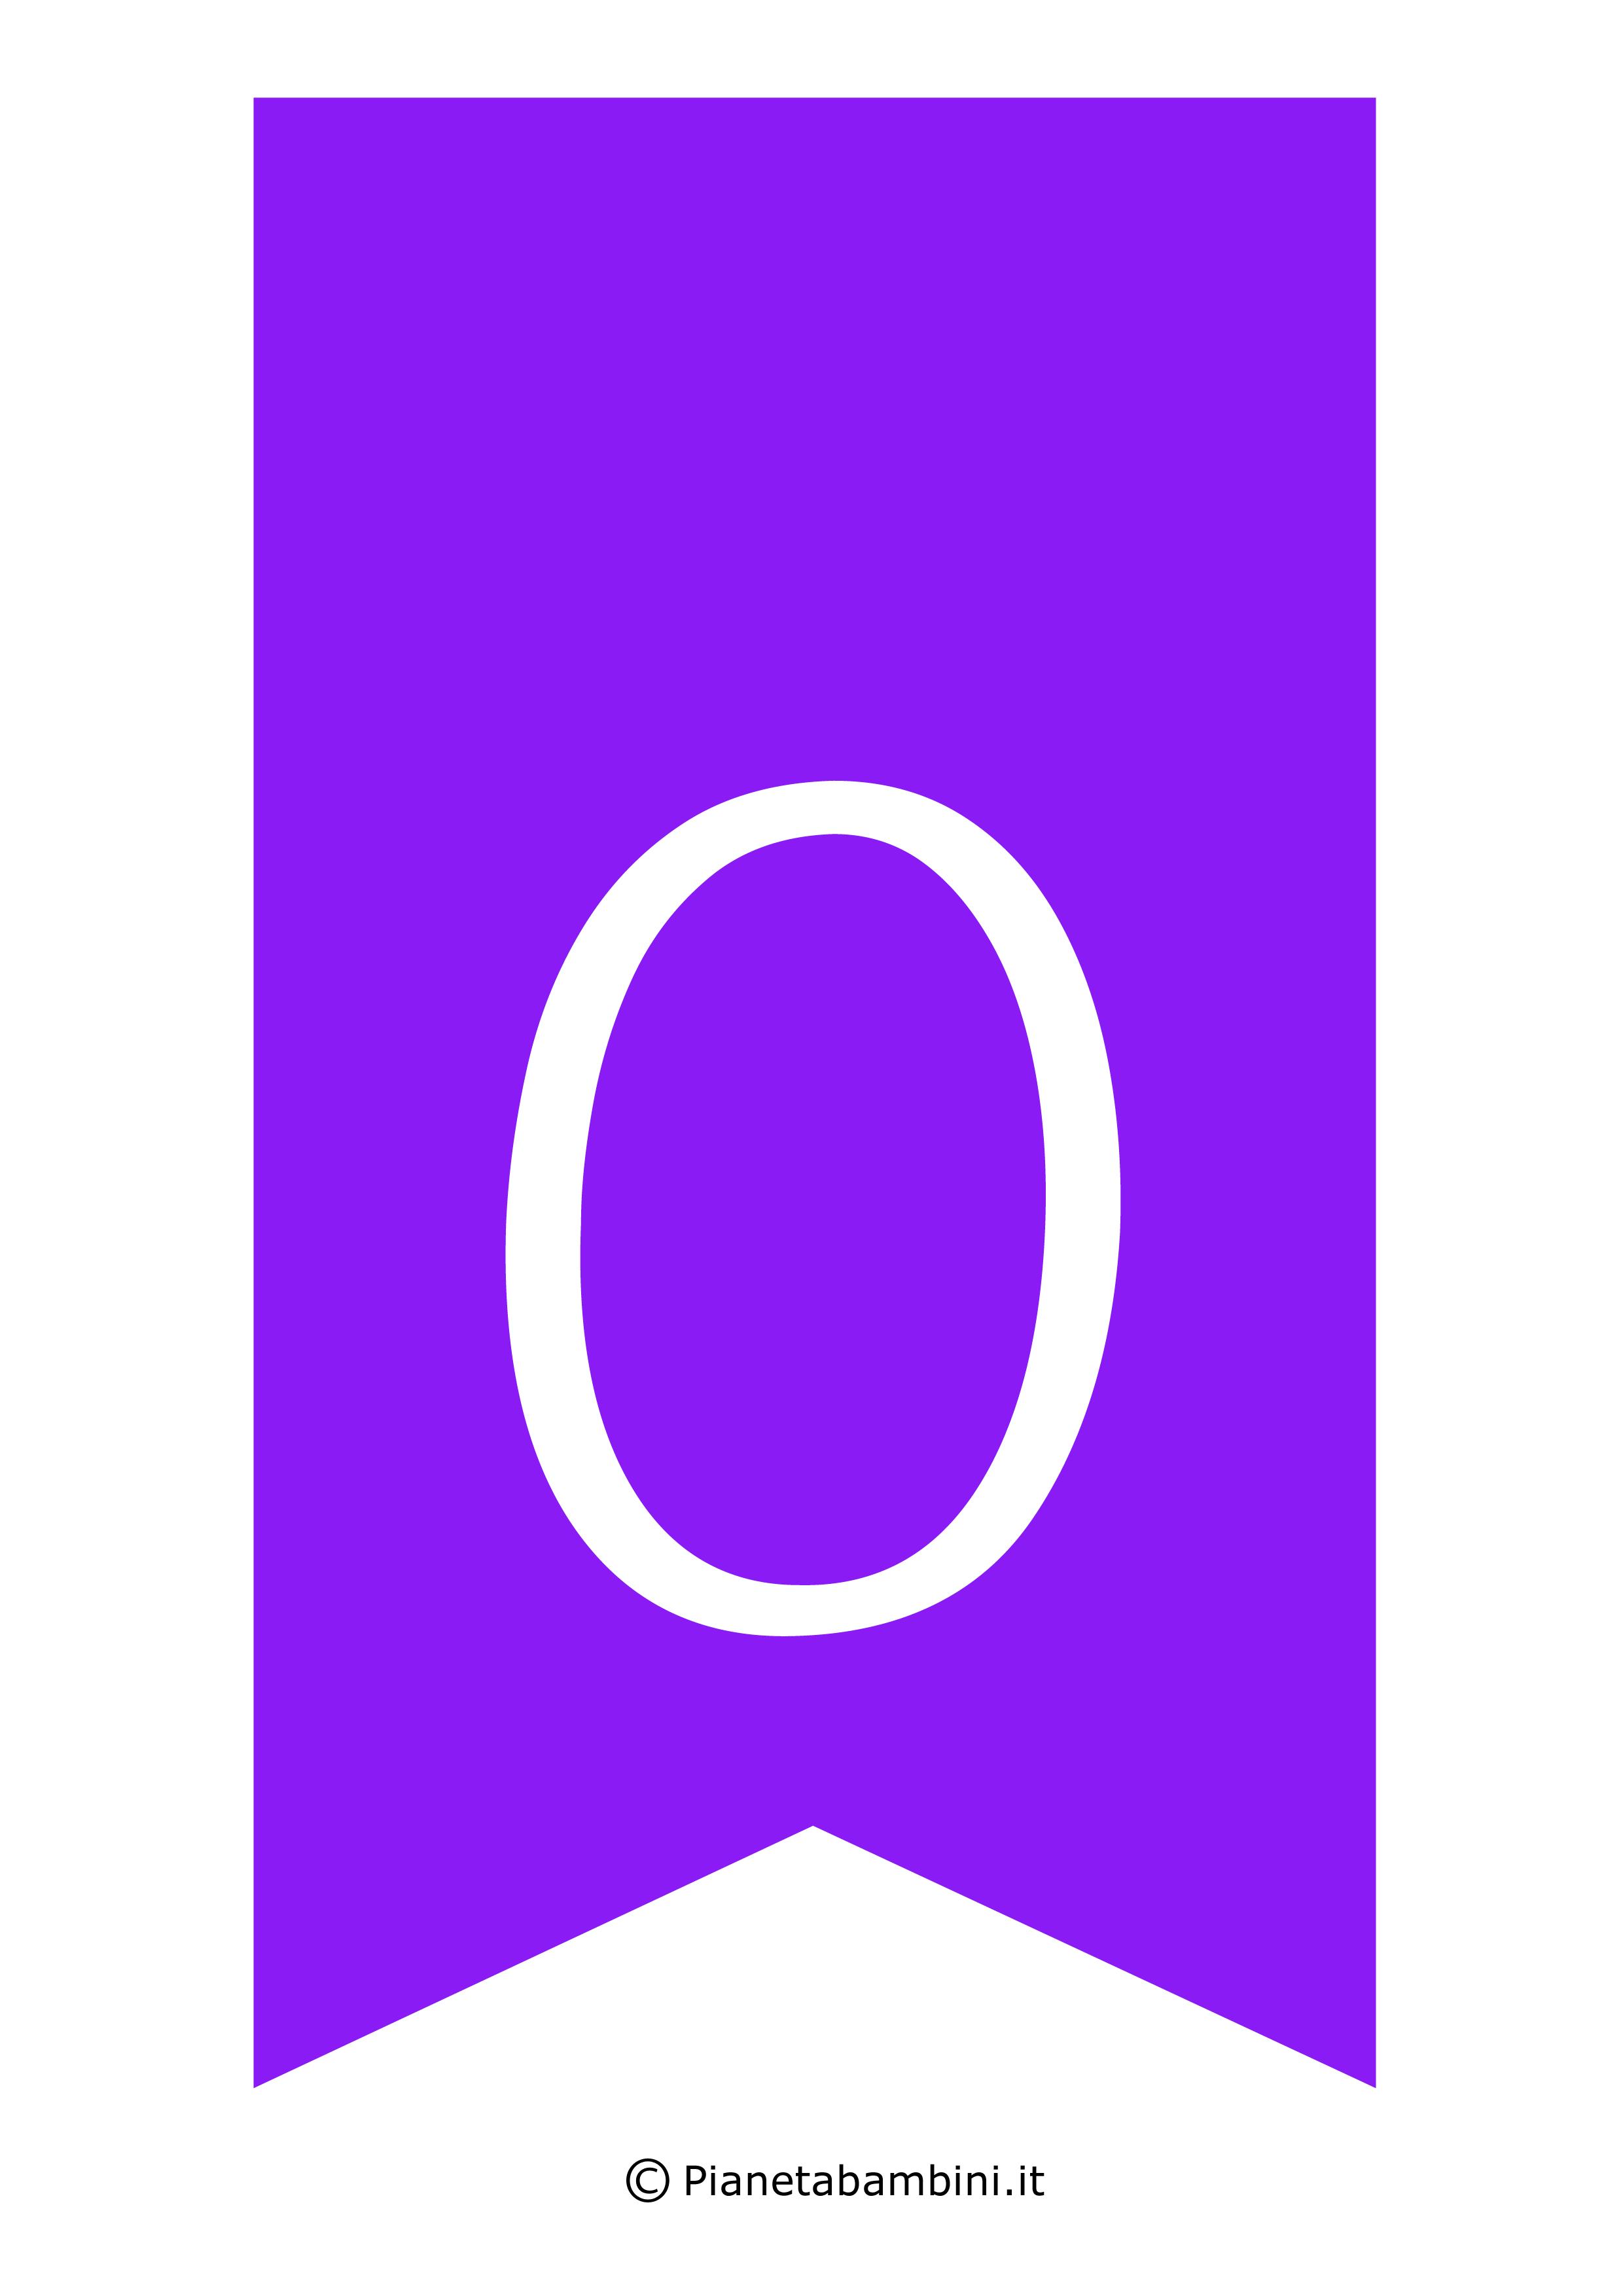 Bandiera_O_2